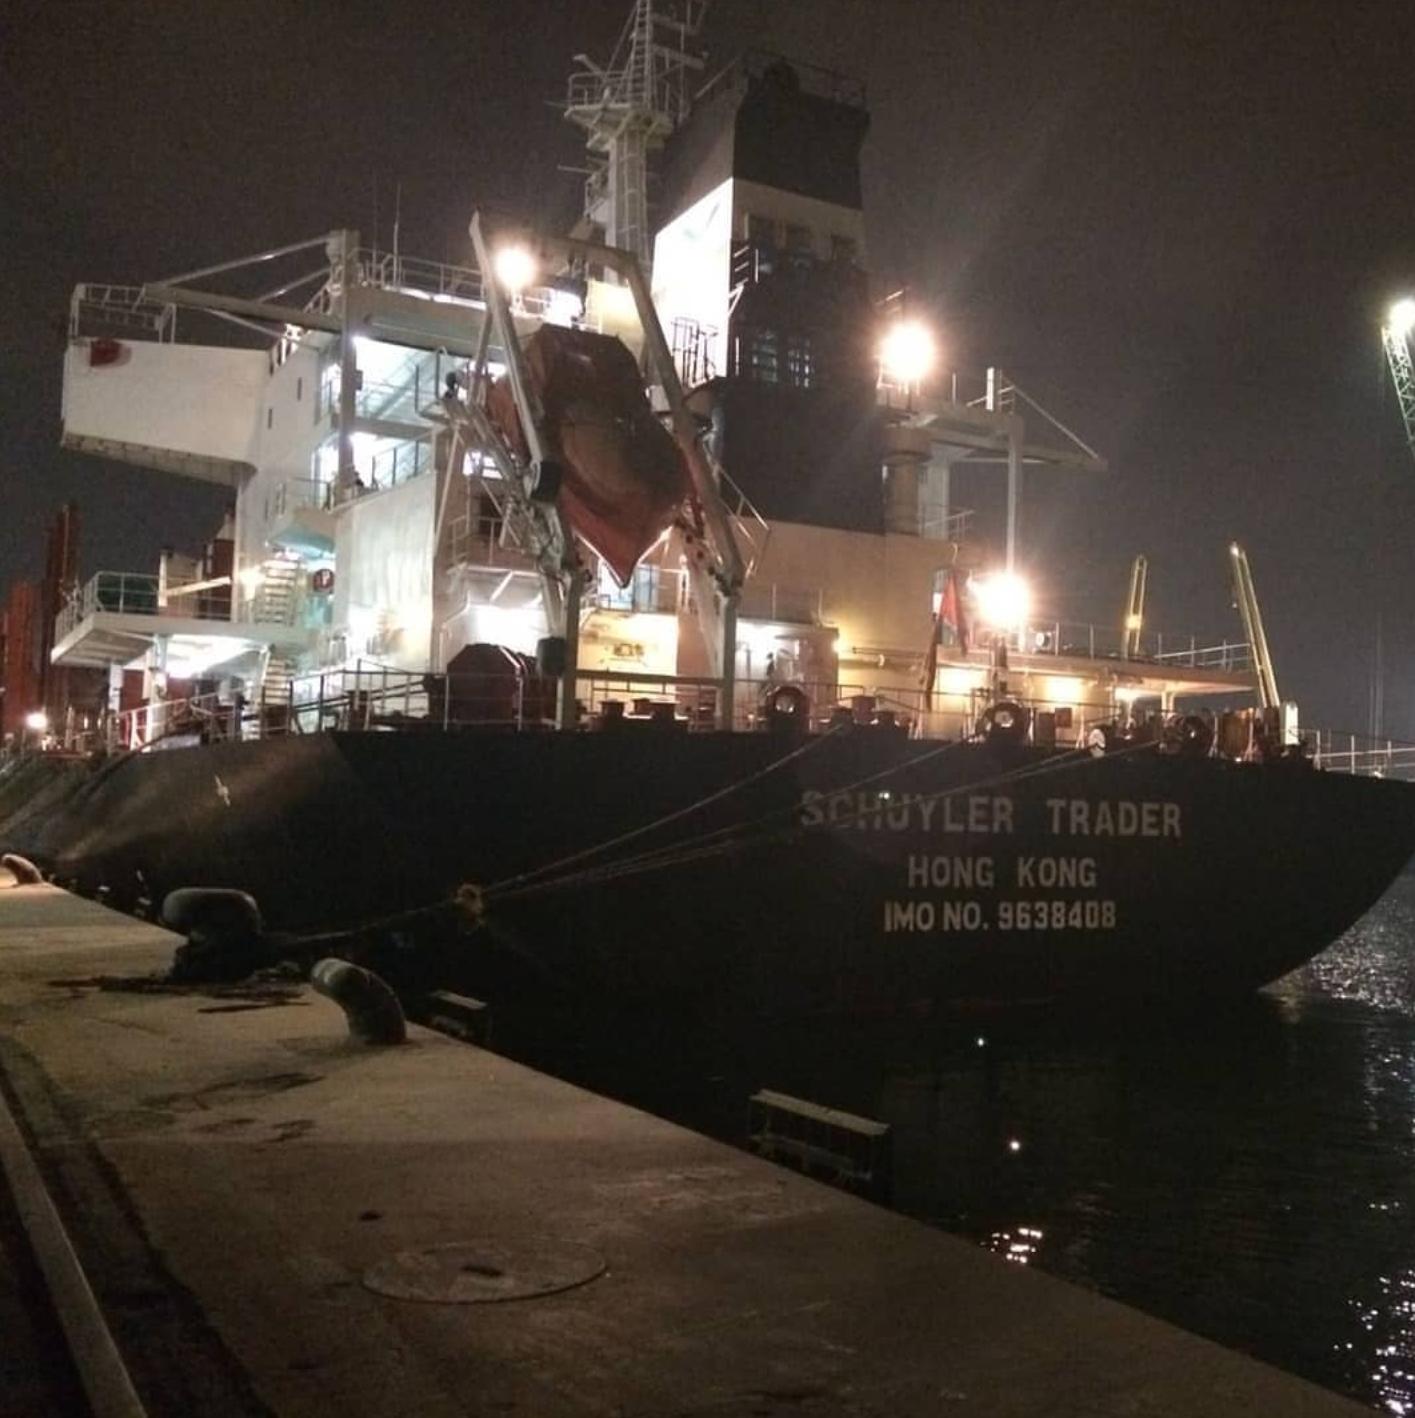 MV SCHUYLER TRADER – DISCHARGING